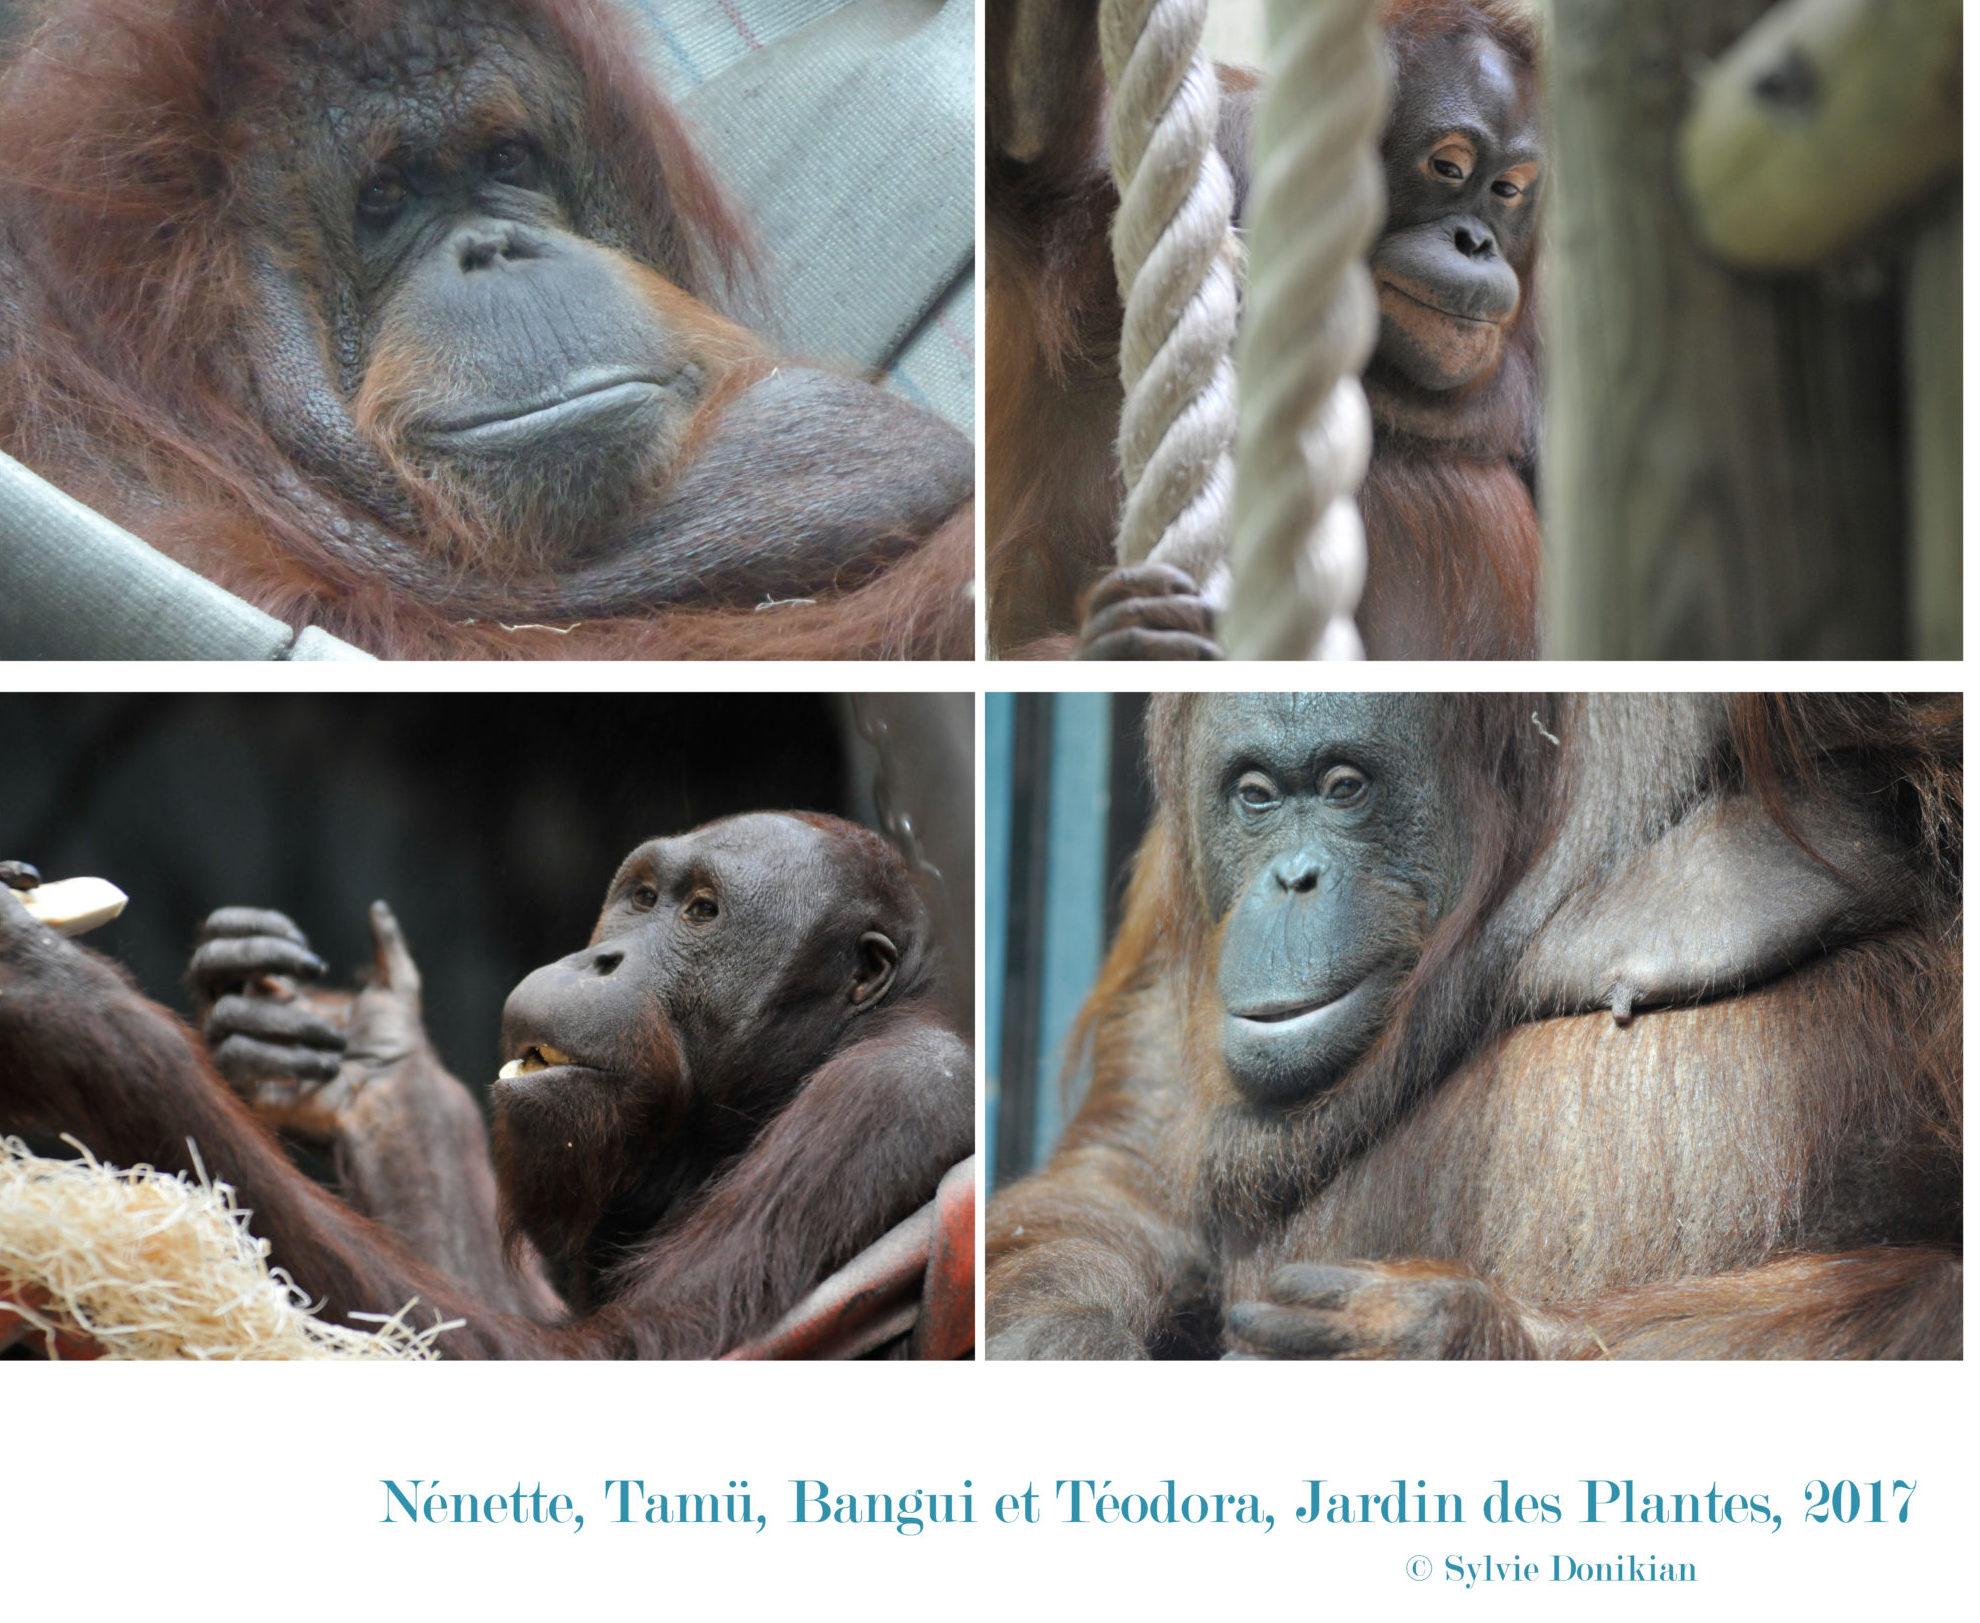 Quatre orangs-outans